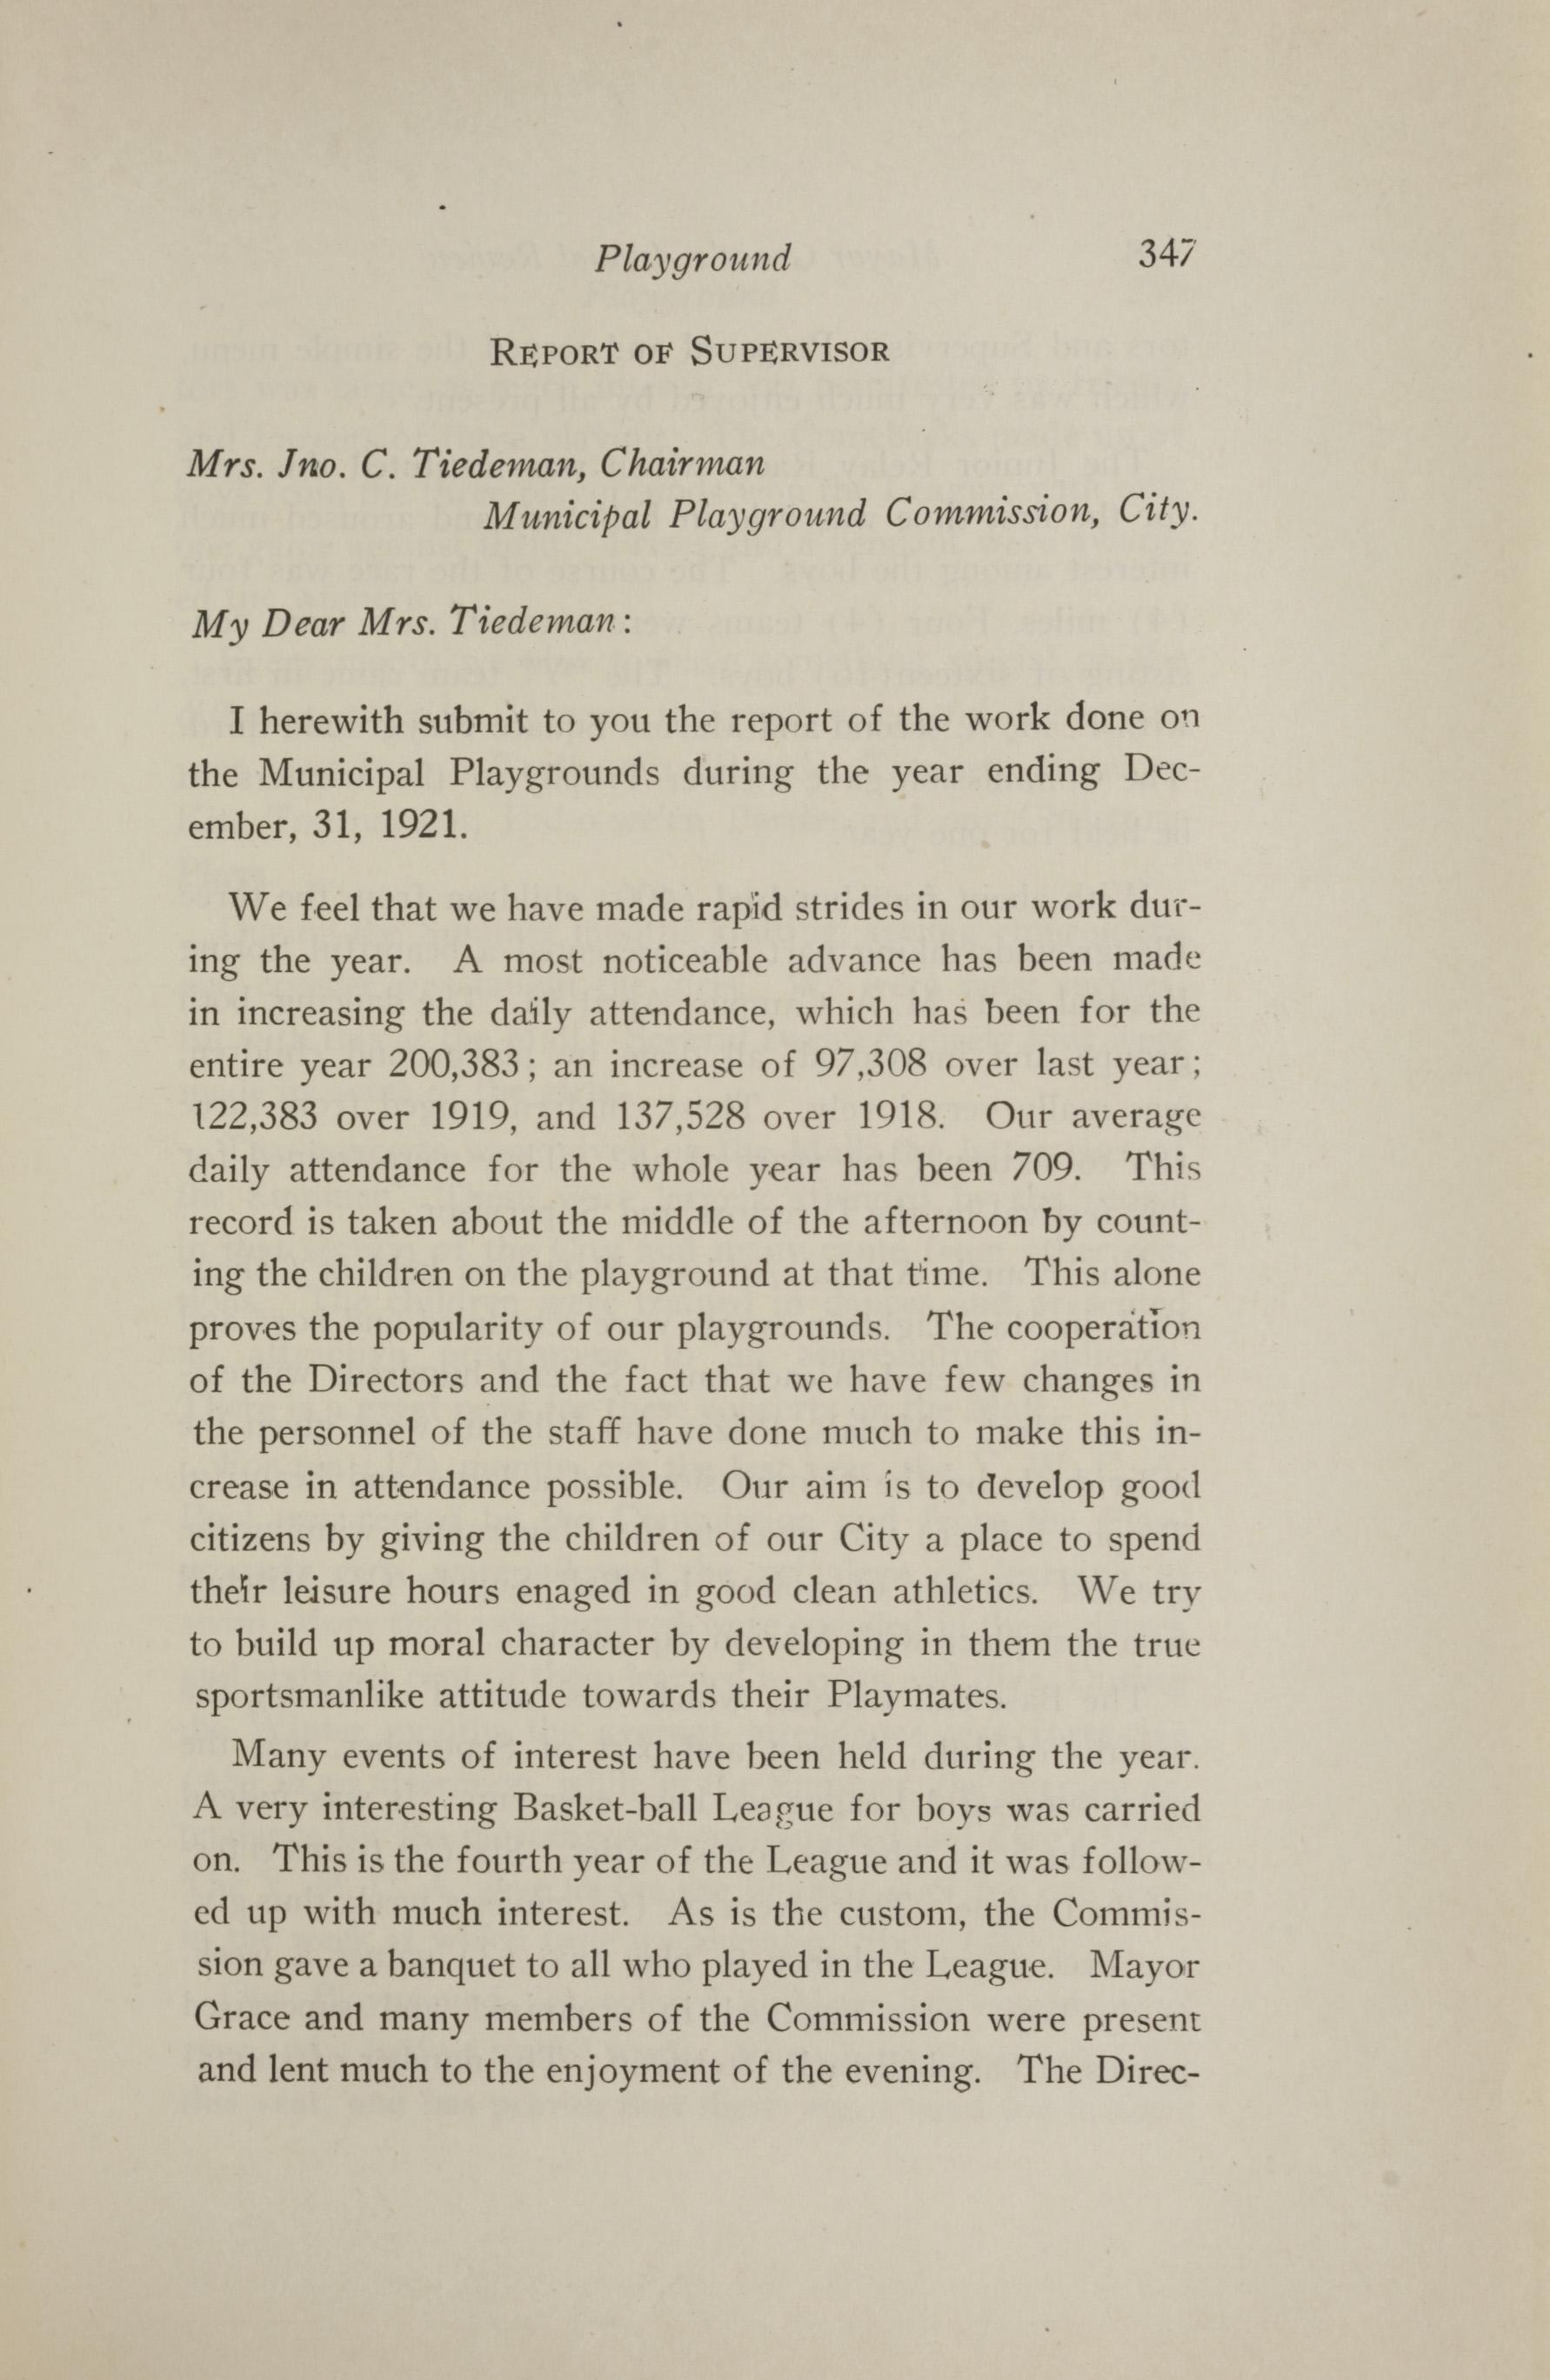 Charleston Yearbook, 1921, page 347